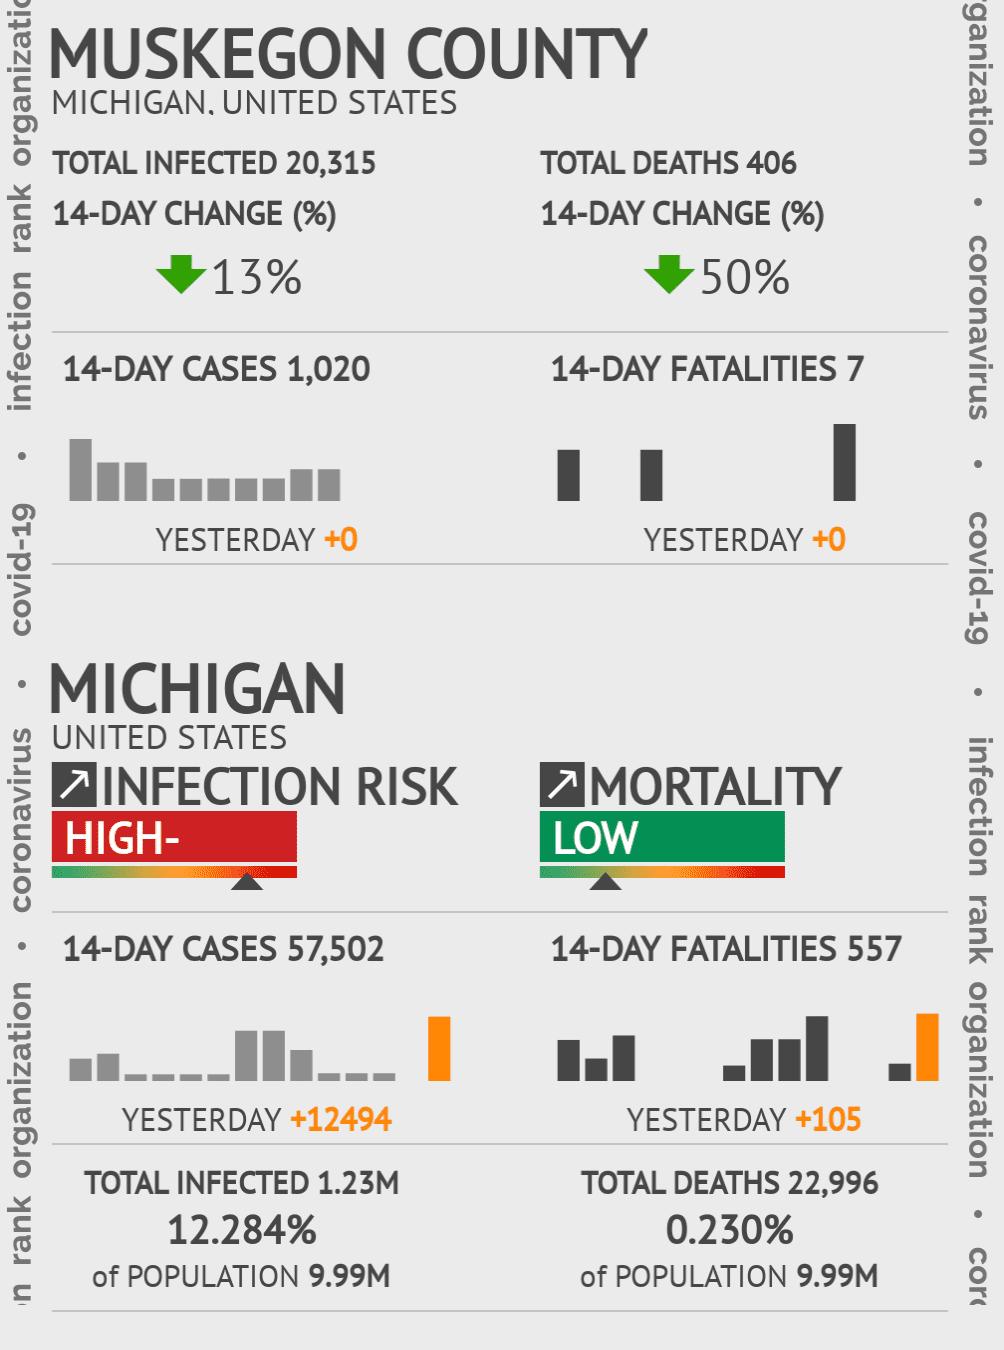 Muskegon County Coronavirus Covid-19 Risk of Infection on February 25, 2021